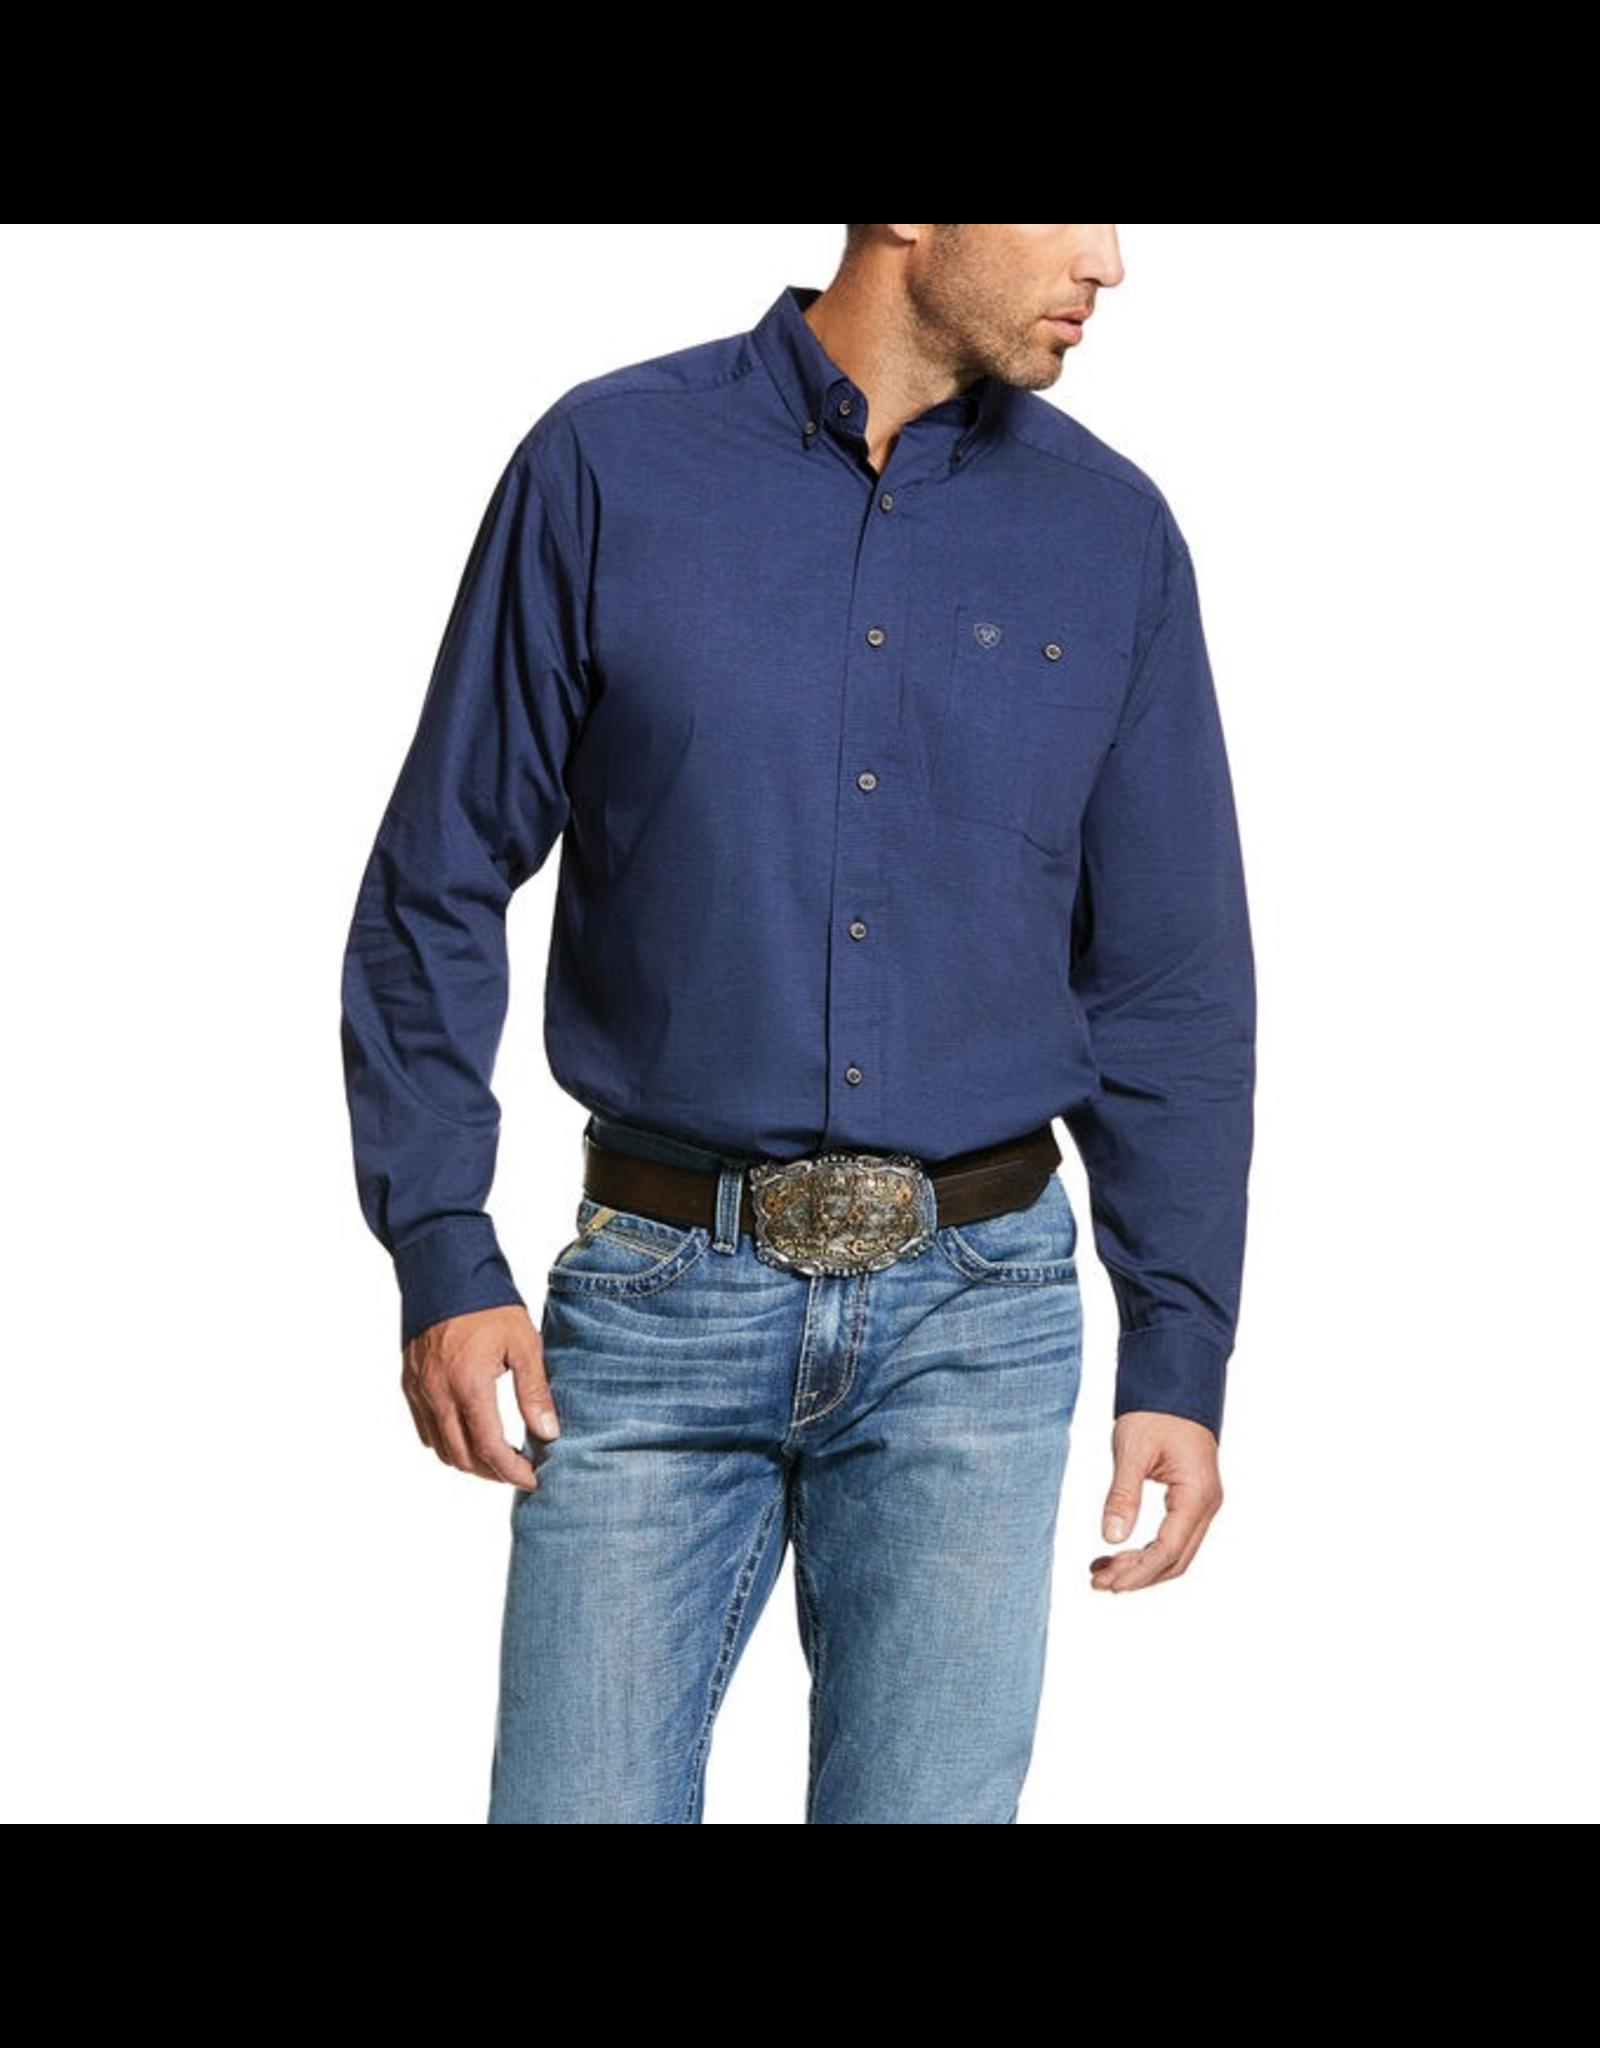 Tops-Men ARIAT Air Flow LS Shirt